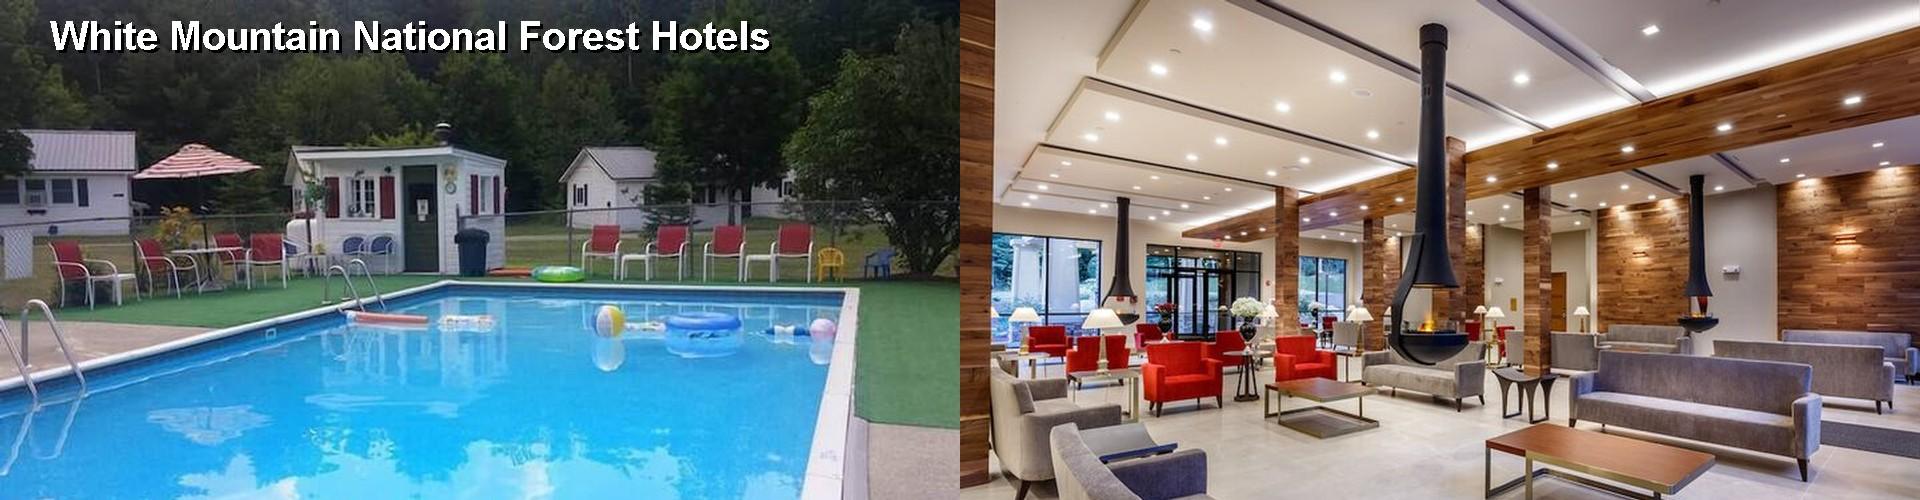 100 Loon Mountain Inn Hotels Near Storyland In Bartlett Nh